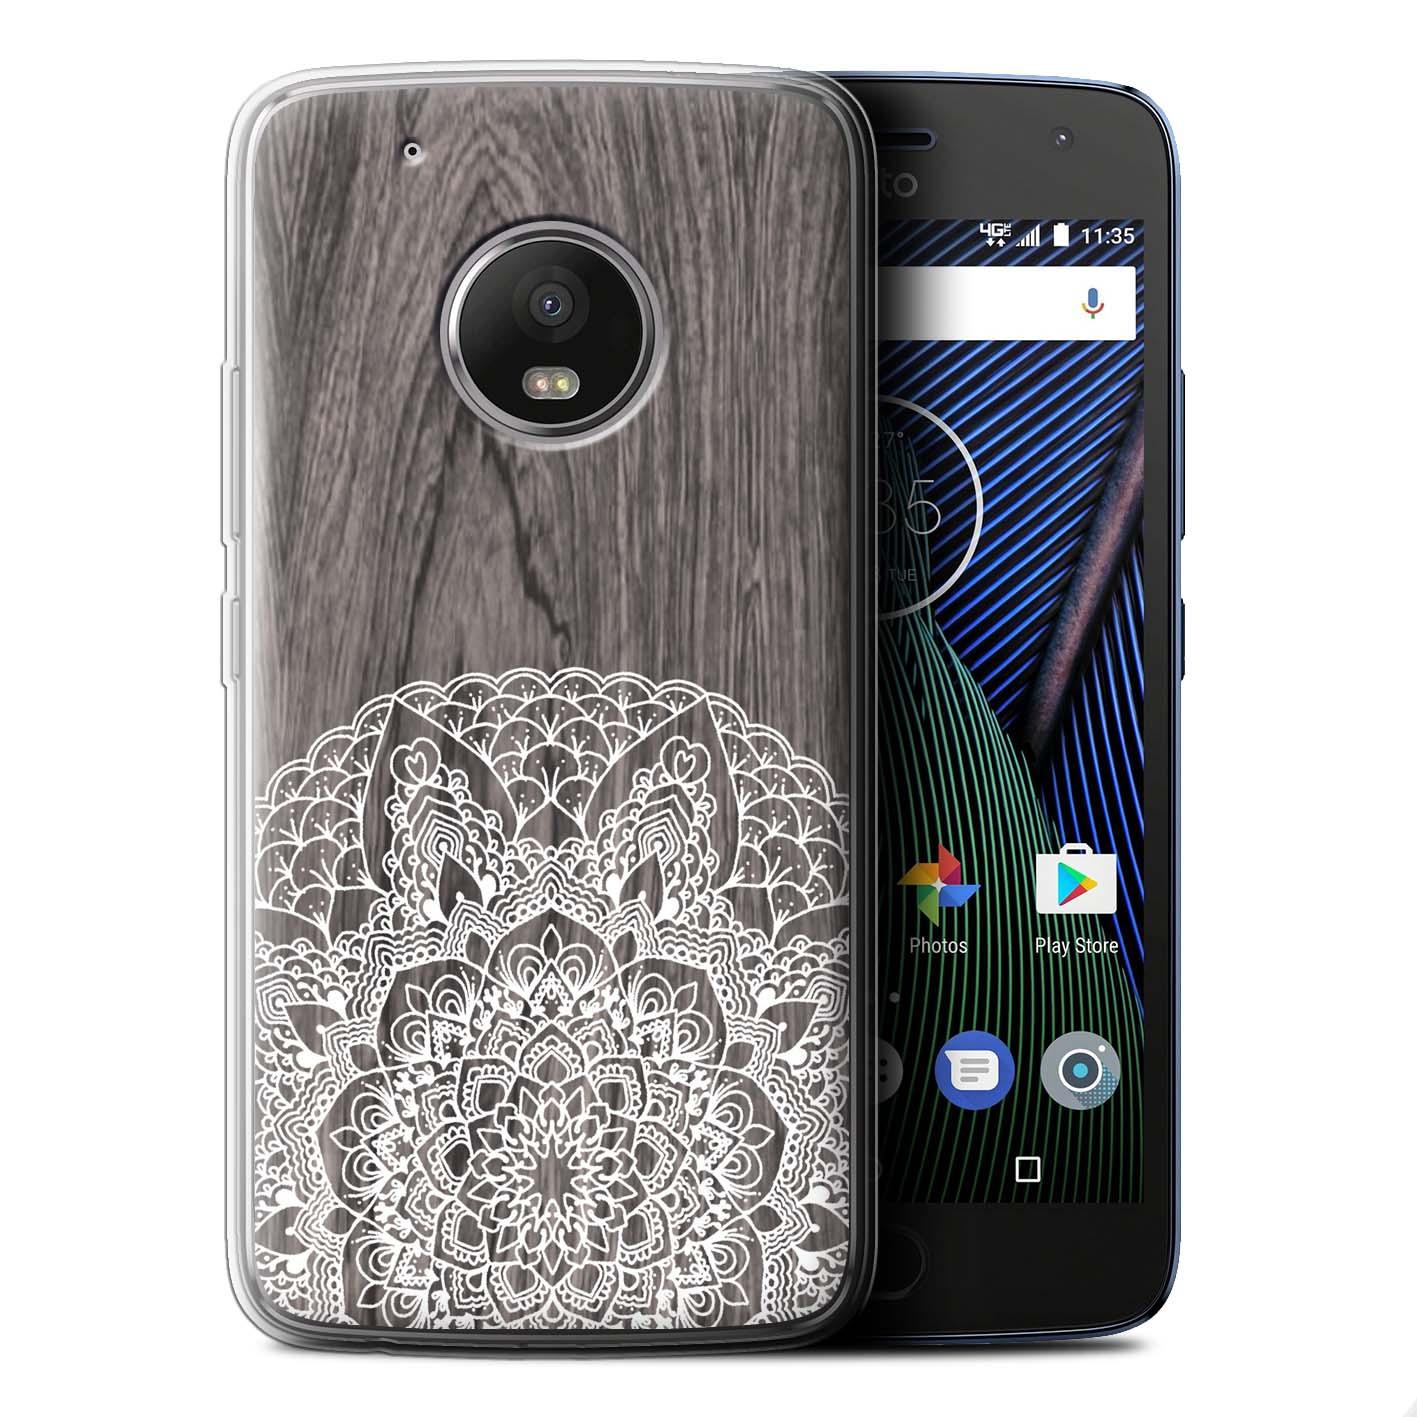 STUFF4-Gel-TPU-Case-Cover-for-Motorola-Moto-G5-Fine-Lace-Wood